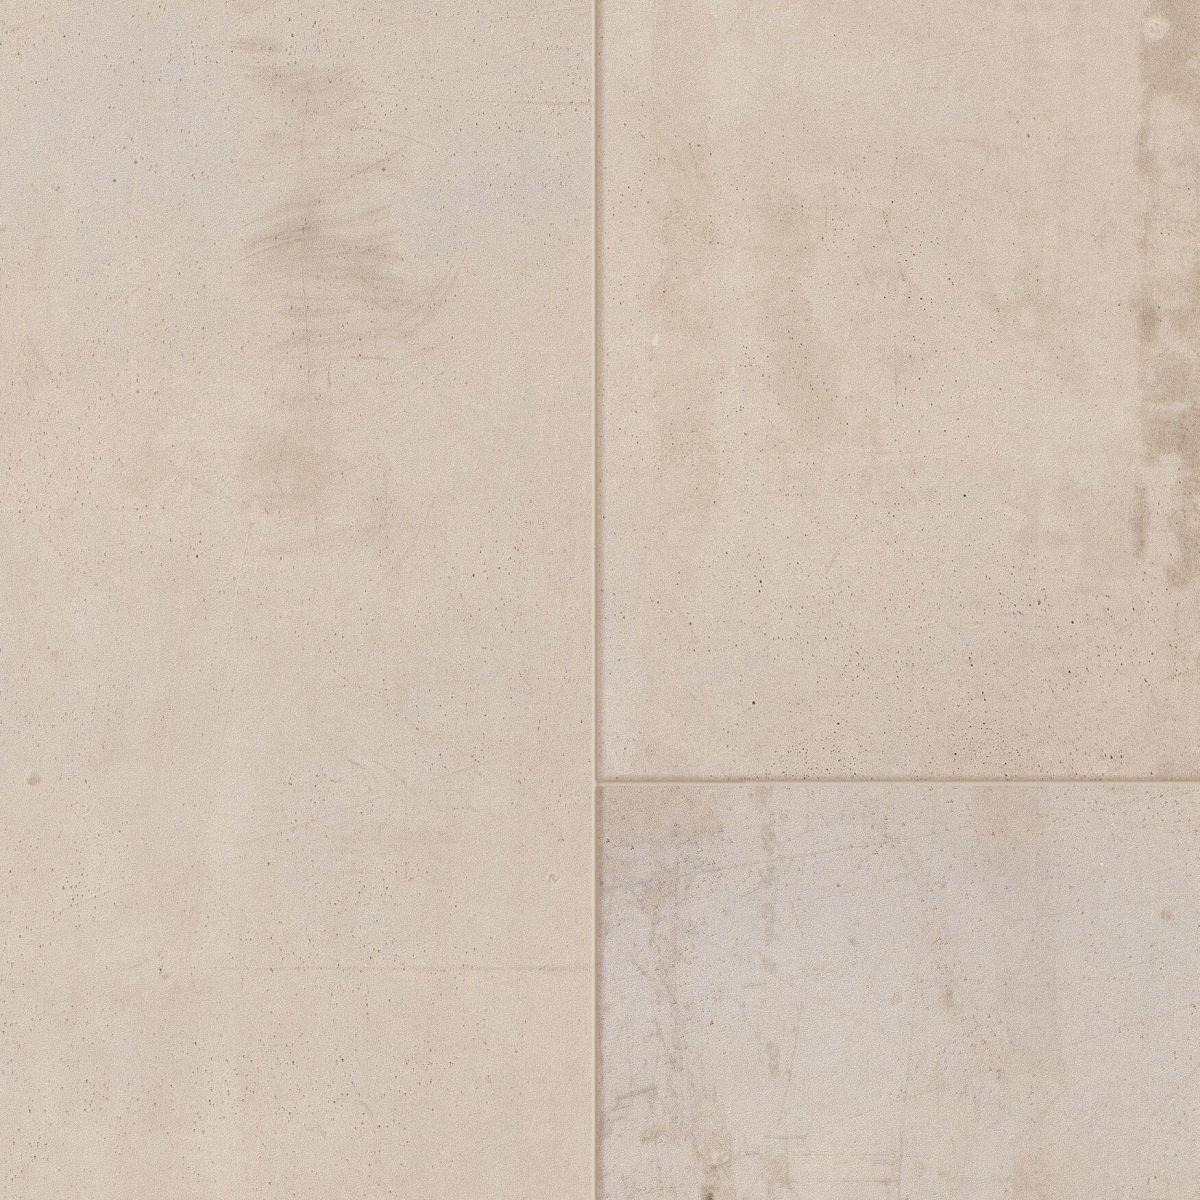 Avatara vloeren steen O6 detail